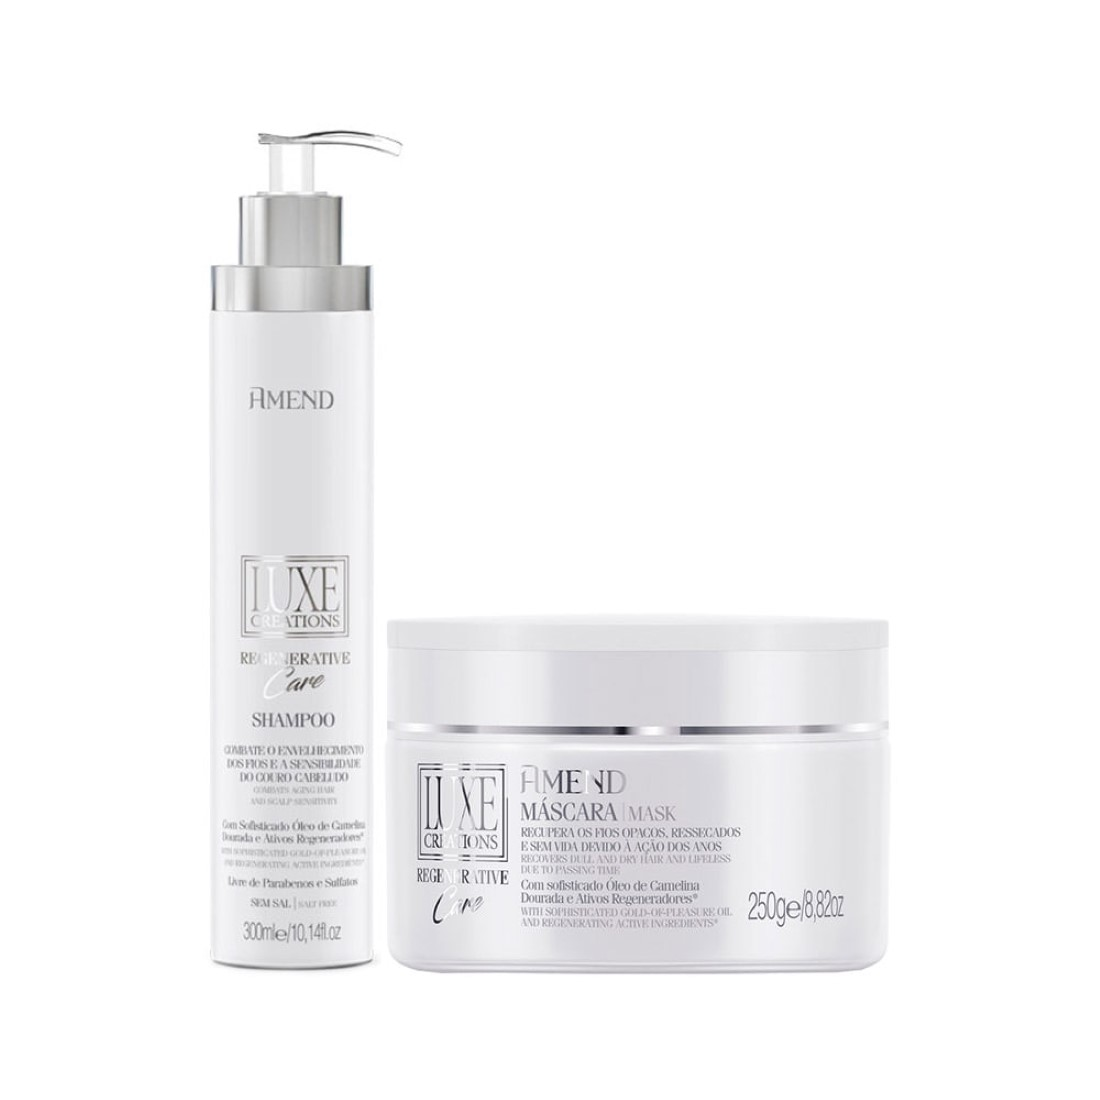 Kit Shampoo e Máscara Luxe Creations Regenerative Care - Amend